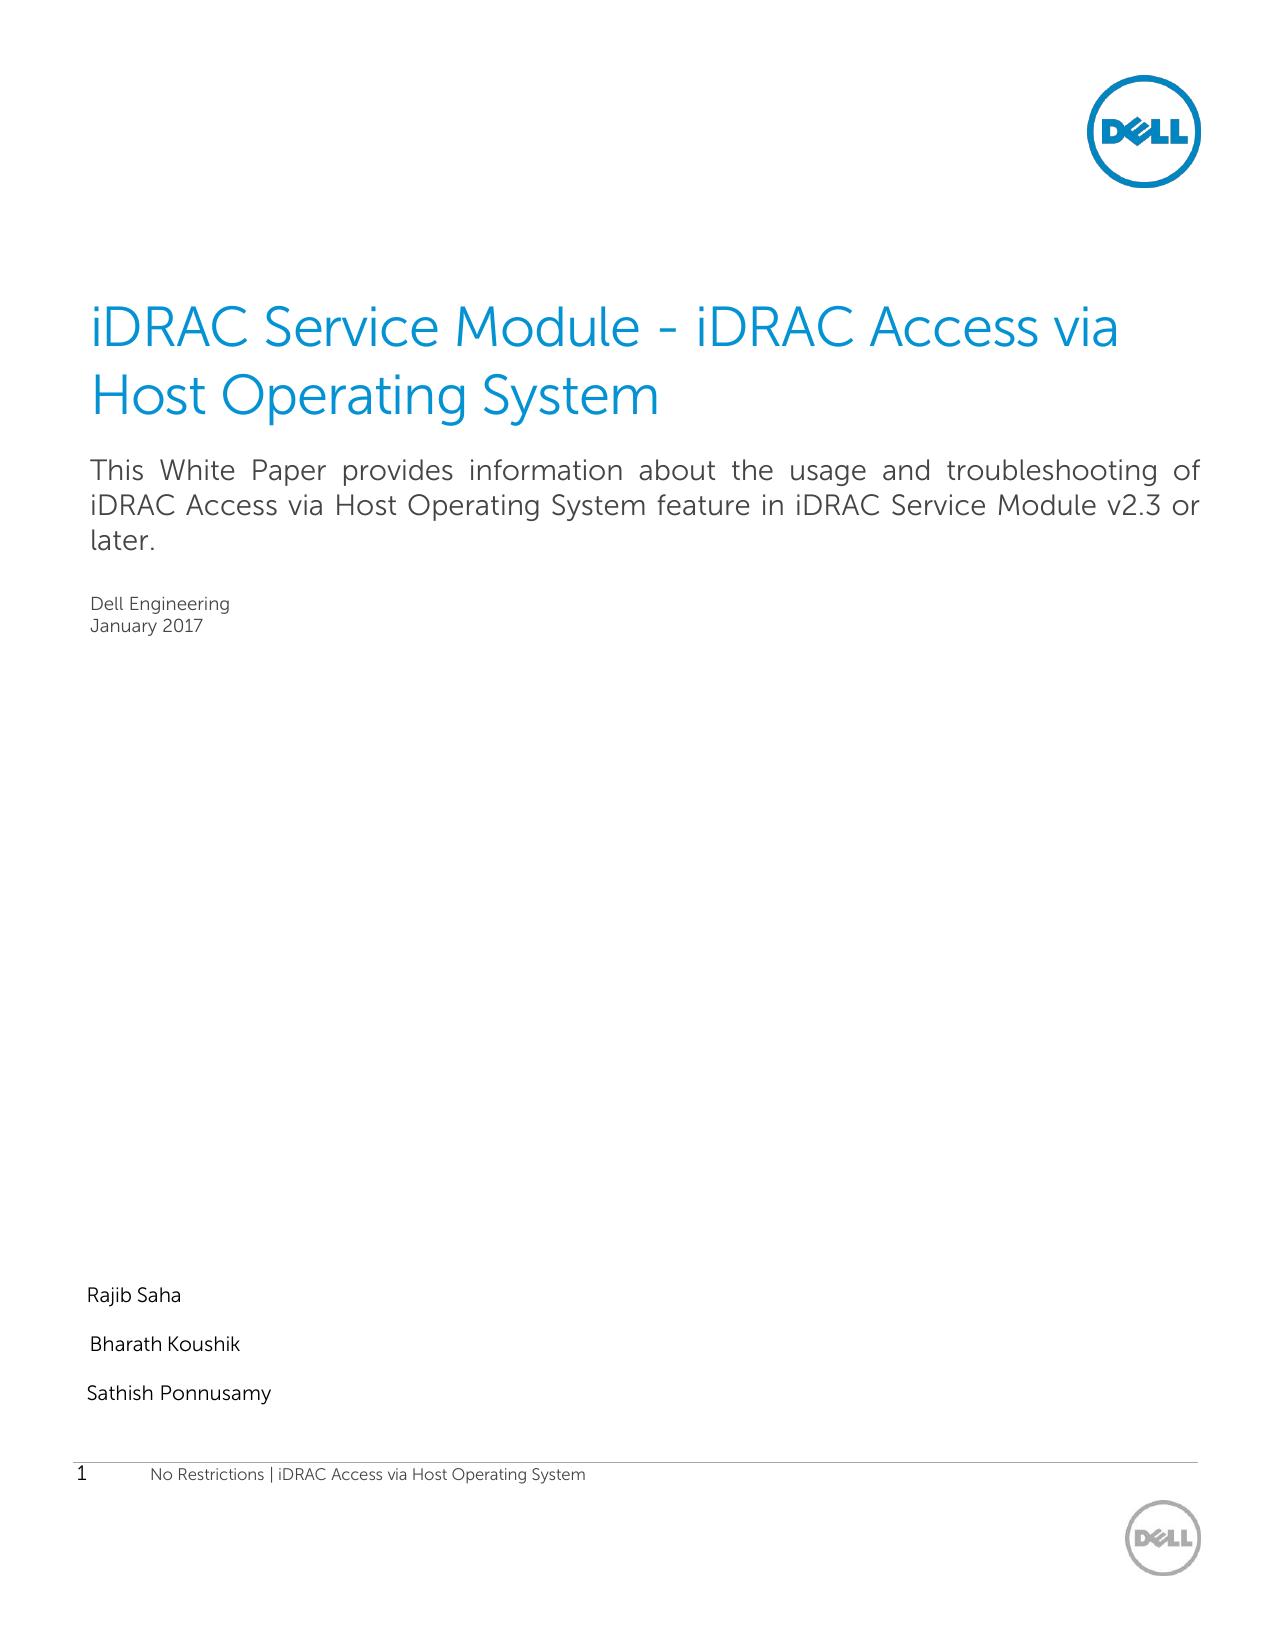 iDRAC Service Module   iDRAC Access via Host Operating System ...